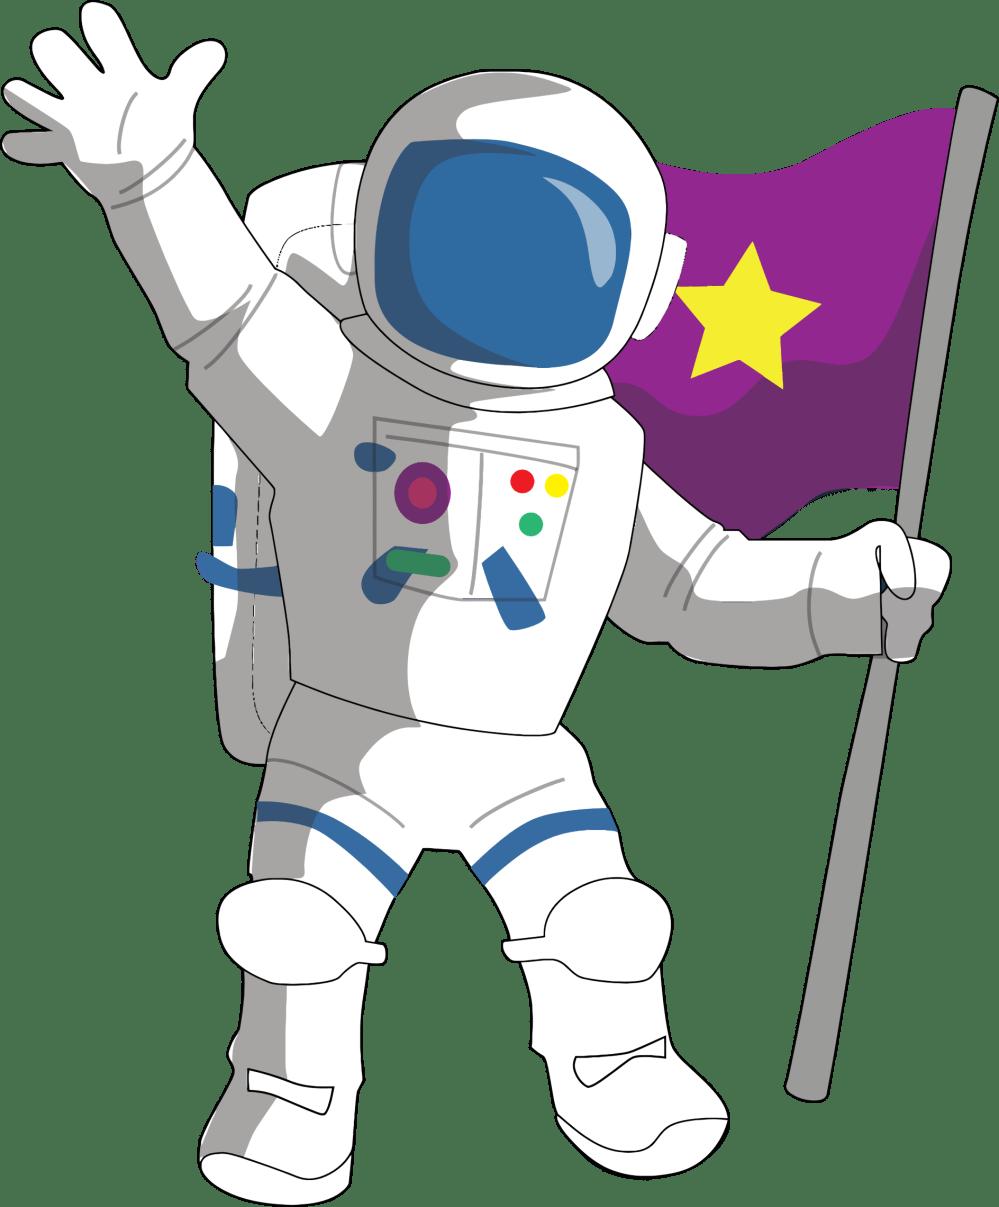 medium resolution of 3 Cosmic 1st Grade Writing Prompts - Studentreasures Blog